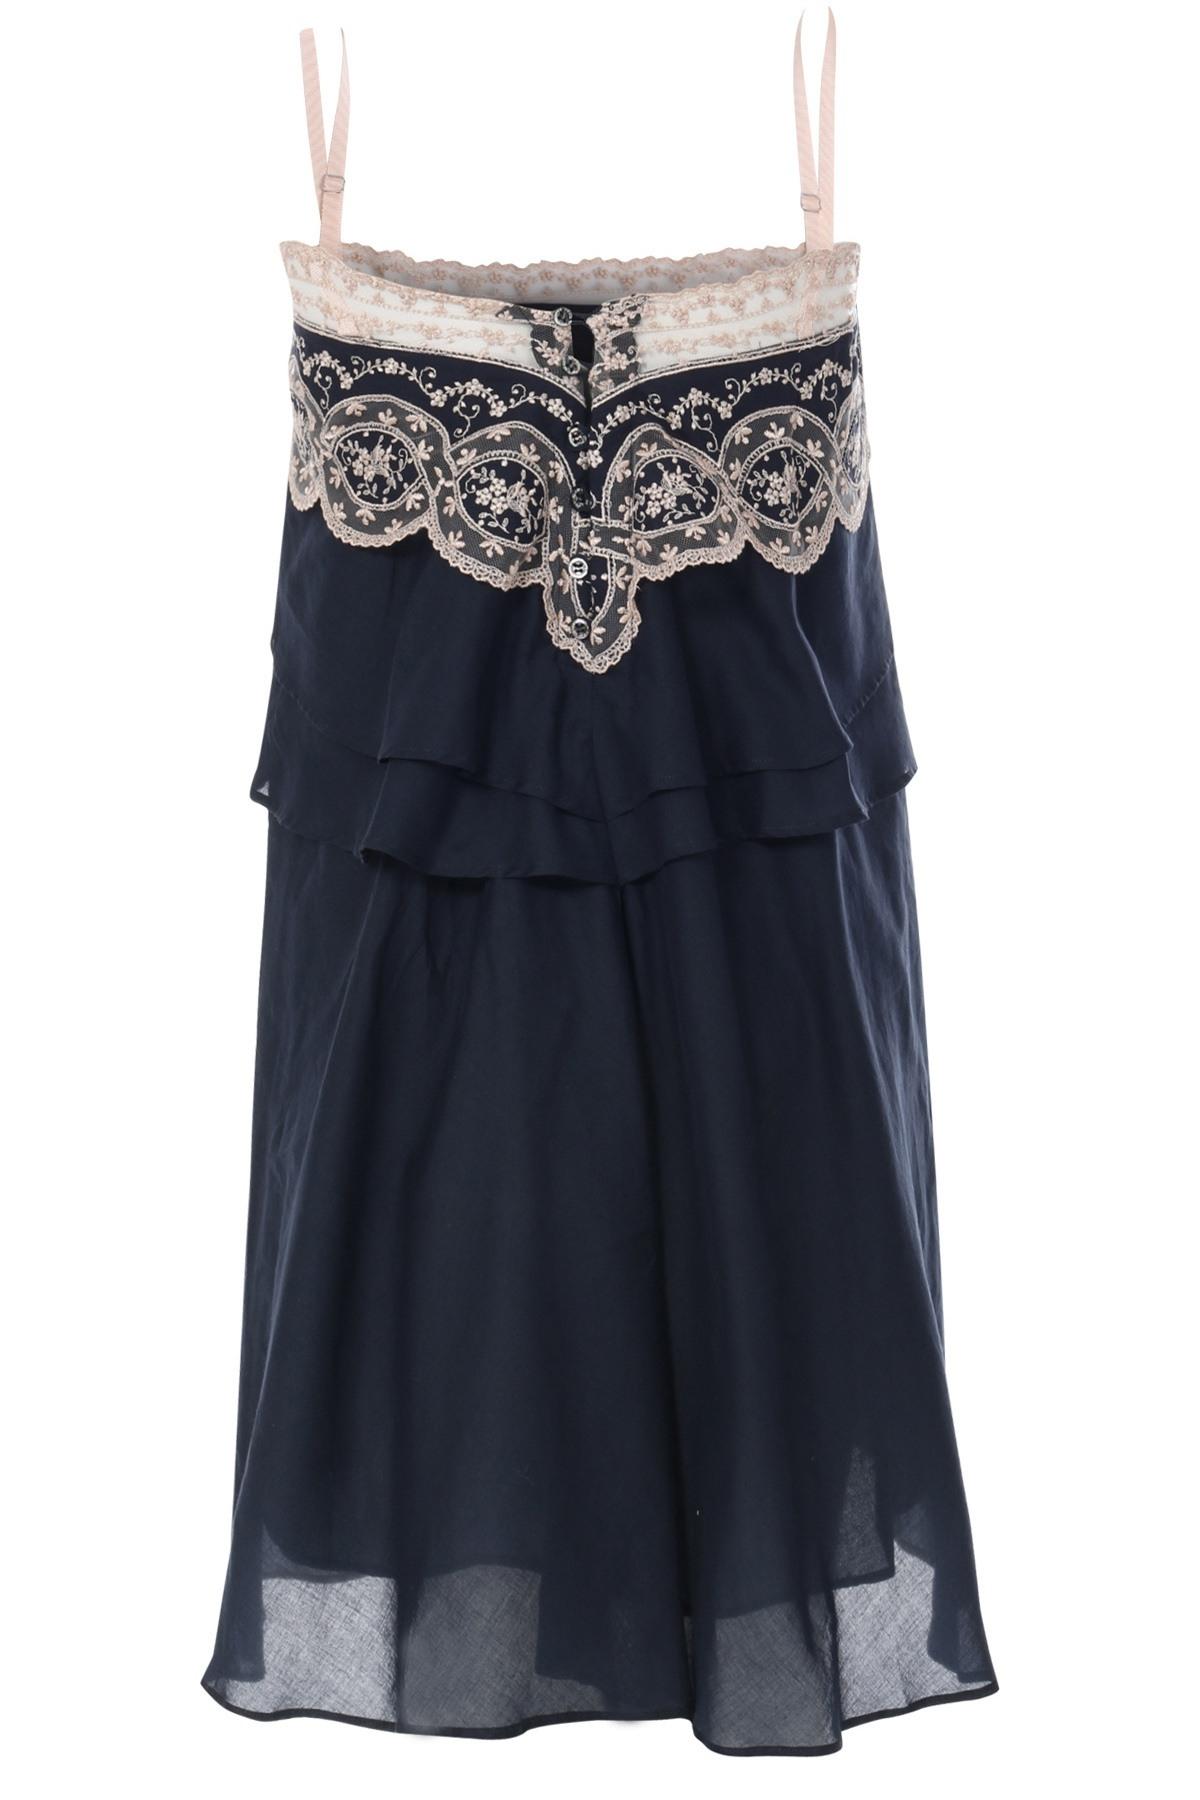 17 Kreativ Kleid Dunkelblau Spitze Ärmel17 Top Kleid Dunkelblau Spitze Vertrieb